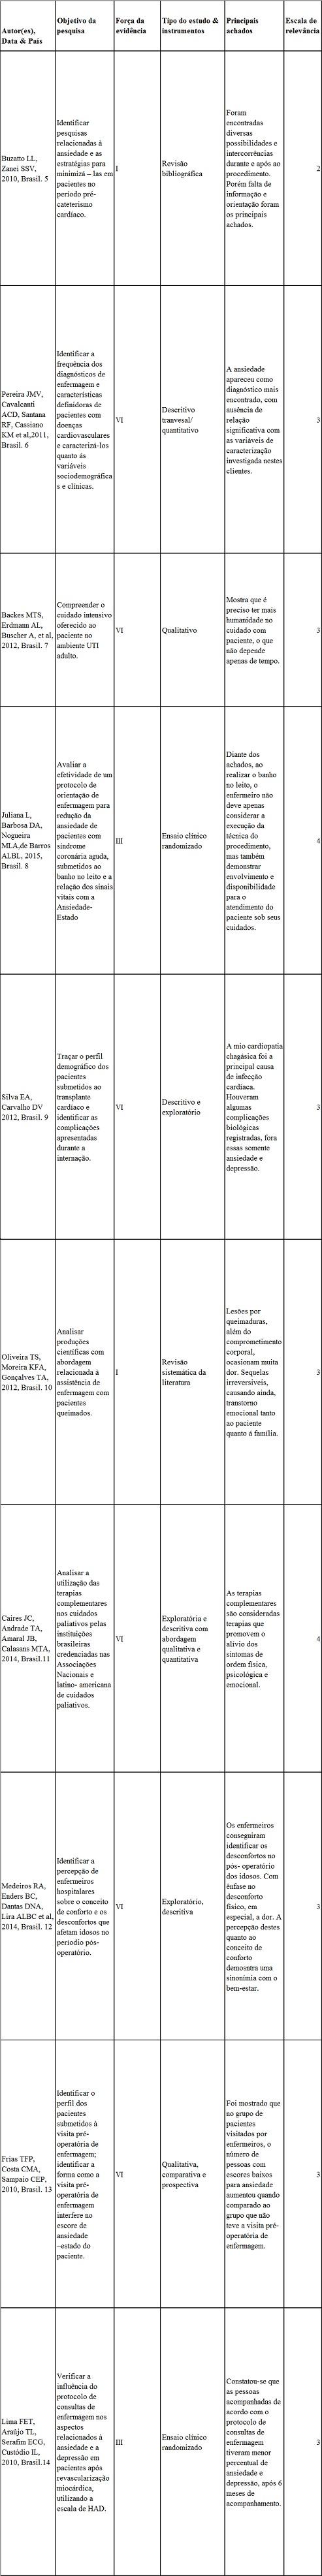 Enfermagem 2012 pdf de diagnostico nanda